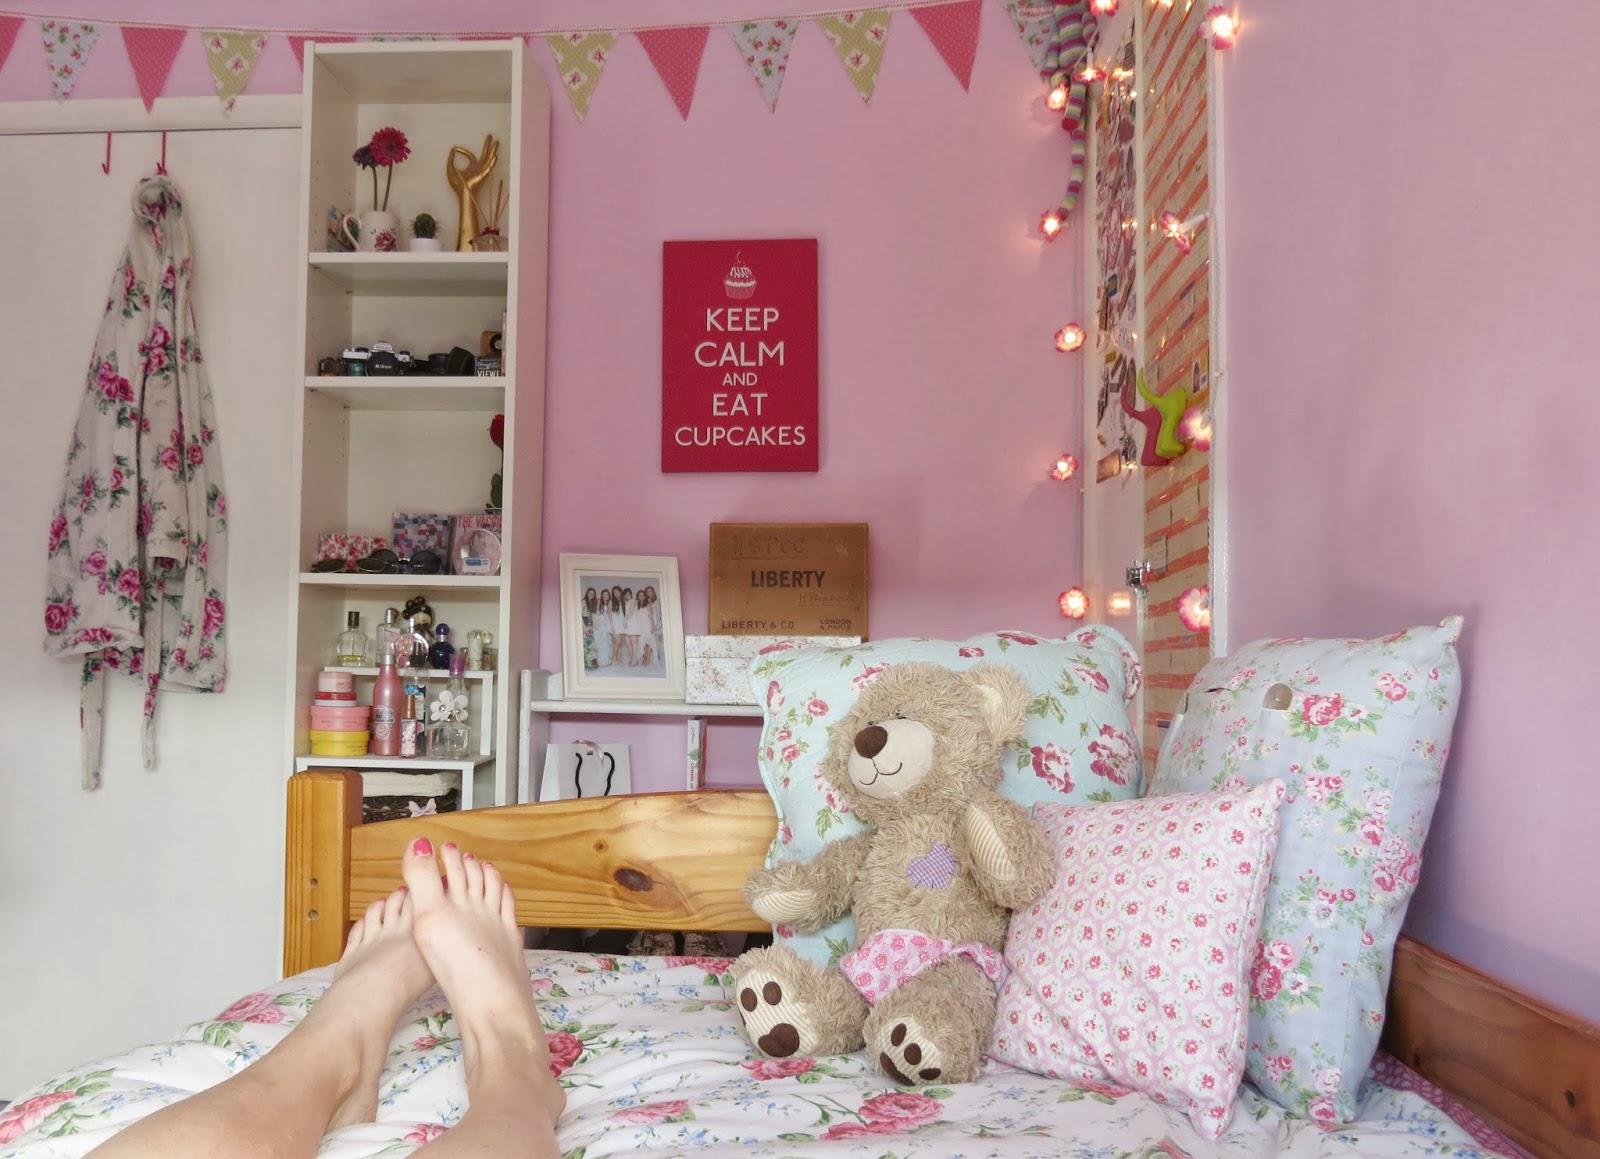 Bedroom Girl Girly Pink Vintage  Girly Bedroom Ideas Uk Ideal Spare Bedroom  Ideas for Home. Pink Vintage Bedroom   SNSM155 com